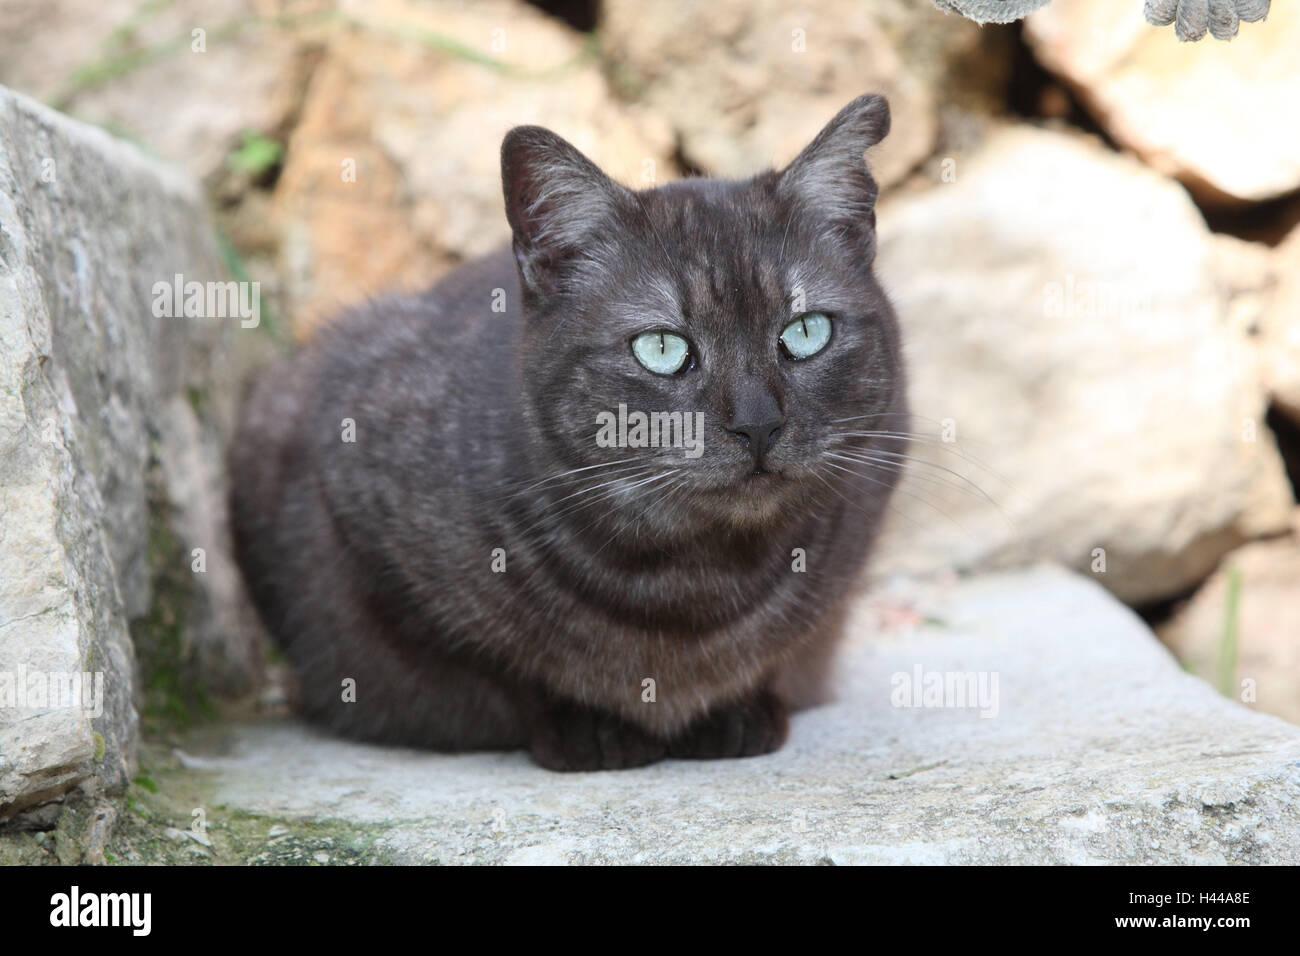 Cat Dark Grey Eyes Light Blue Crouch Stairs Animals Mammals Stock Photo Alamy